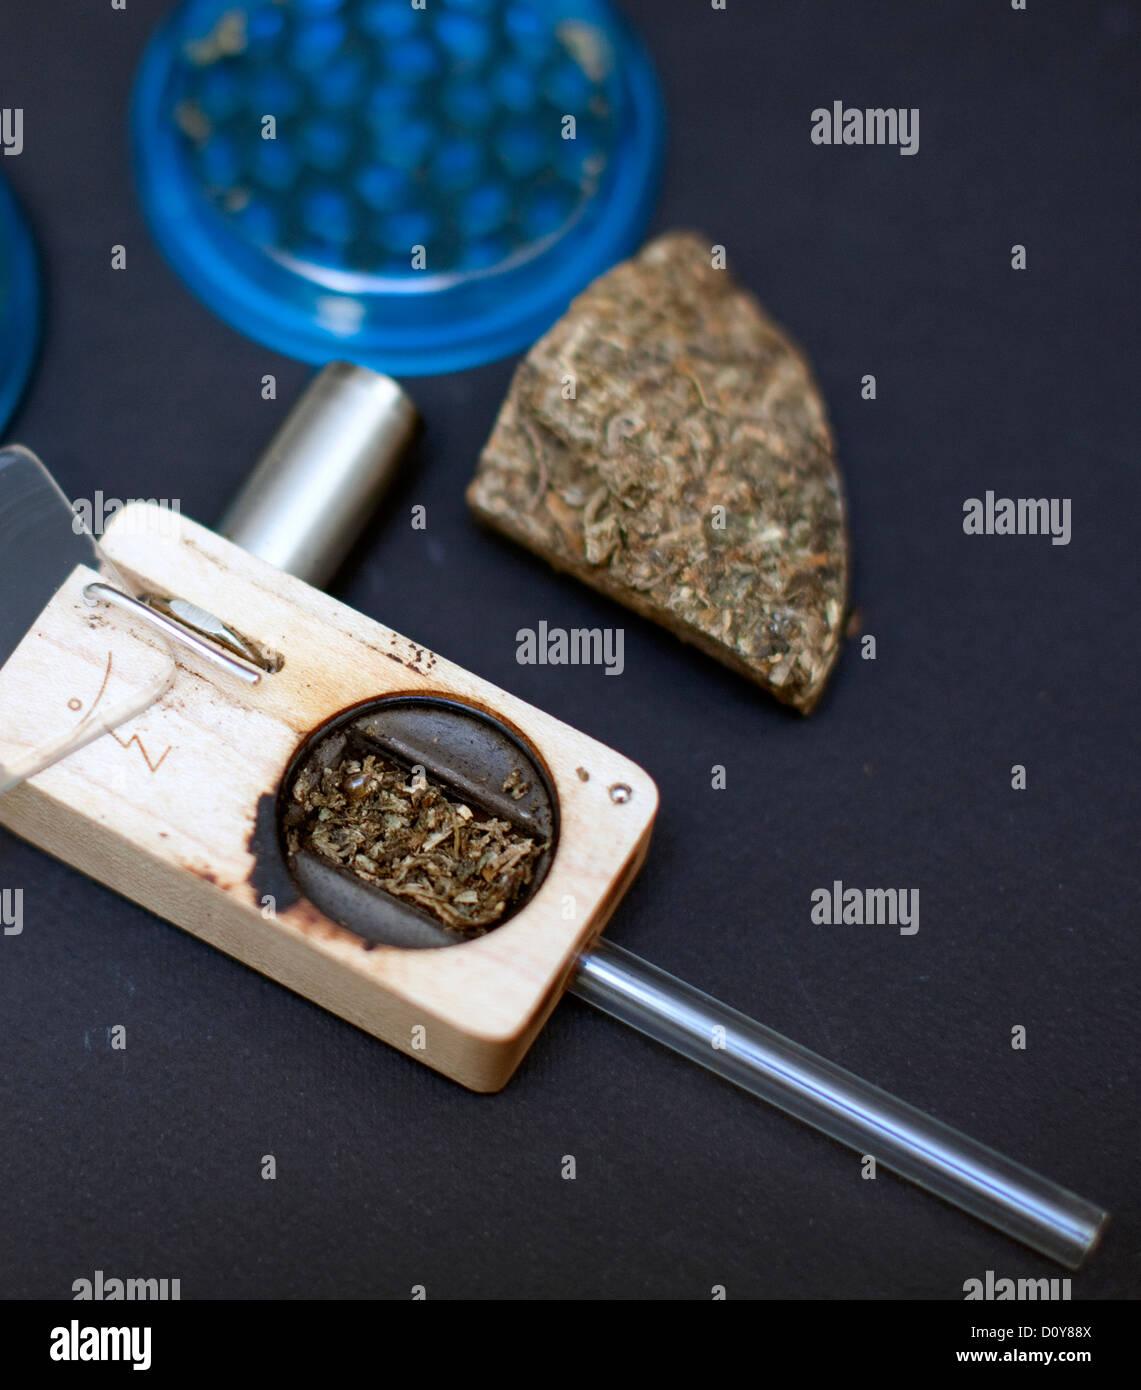 Battery-powered vaporiser for enjoying smoke-free marijuana, London - Stock Image